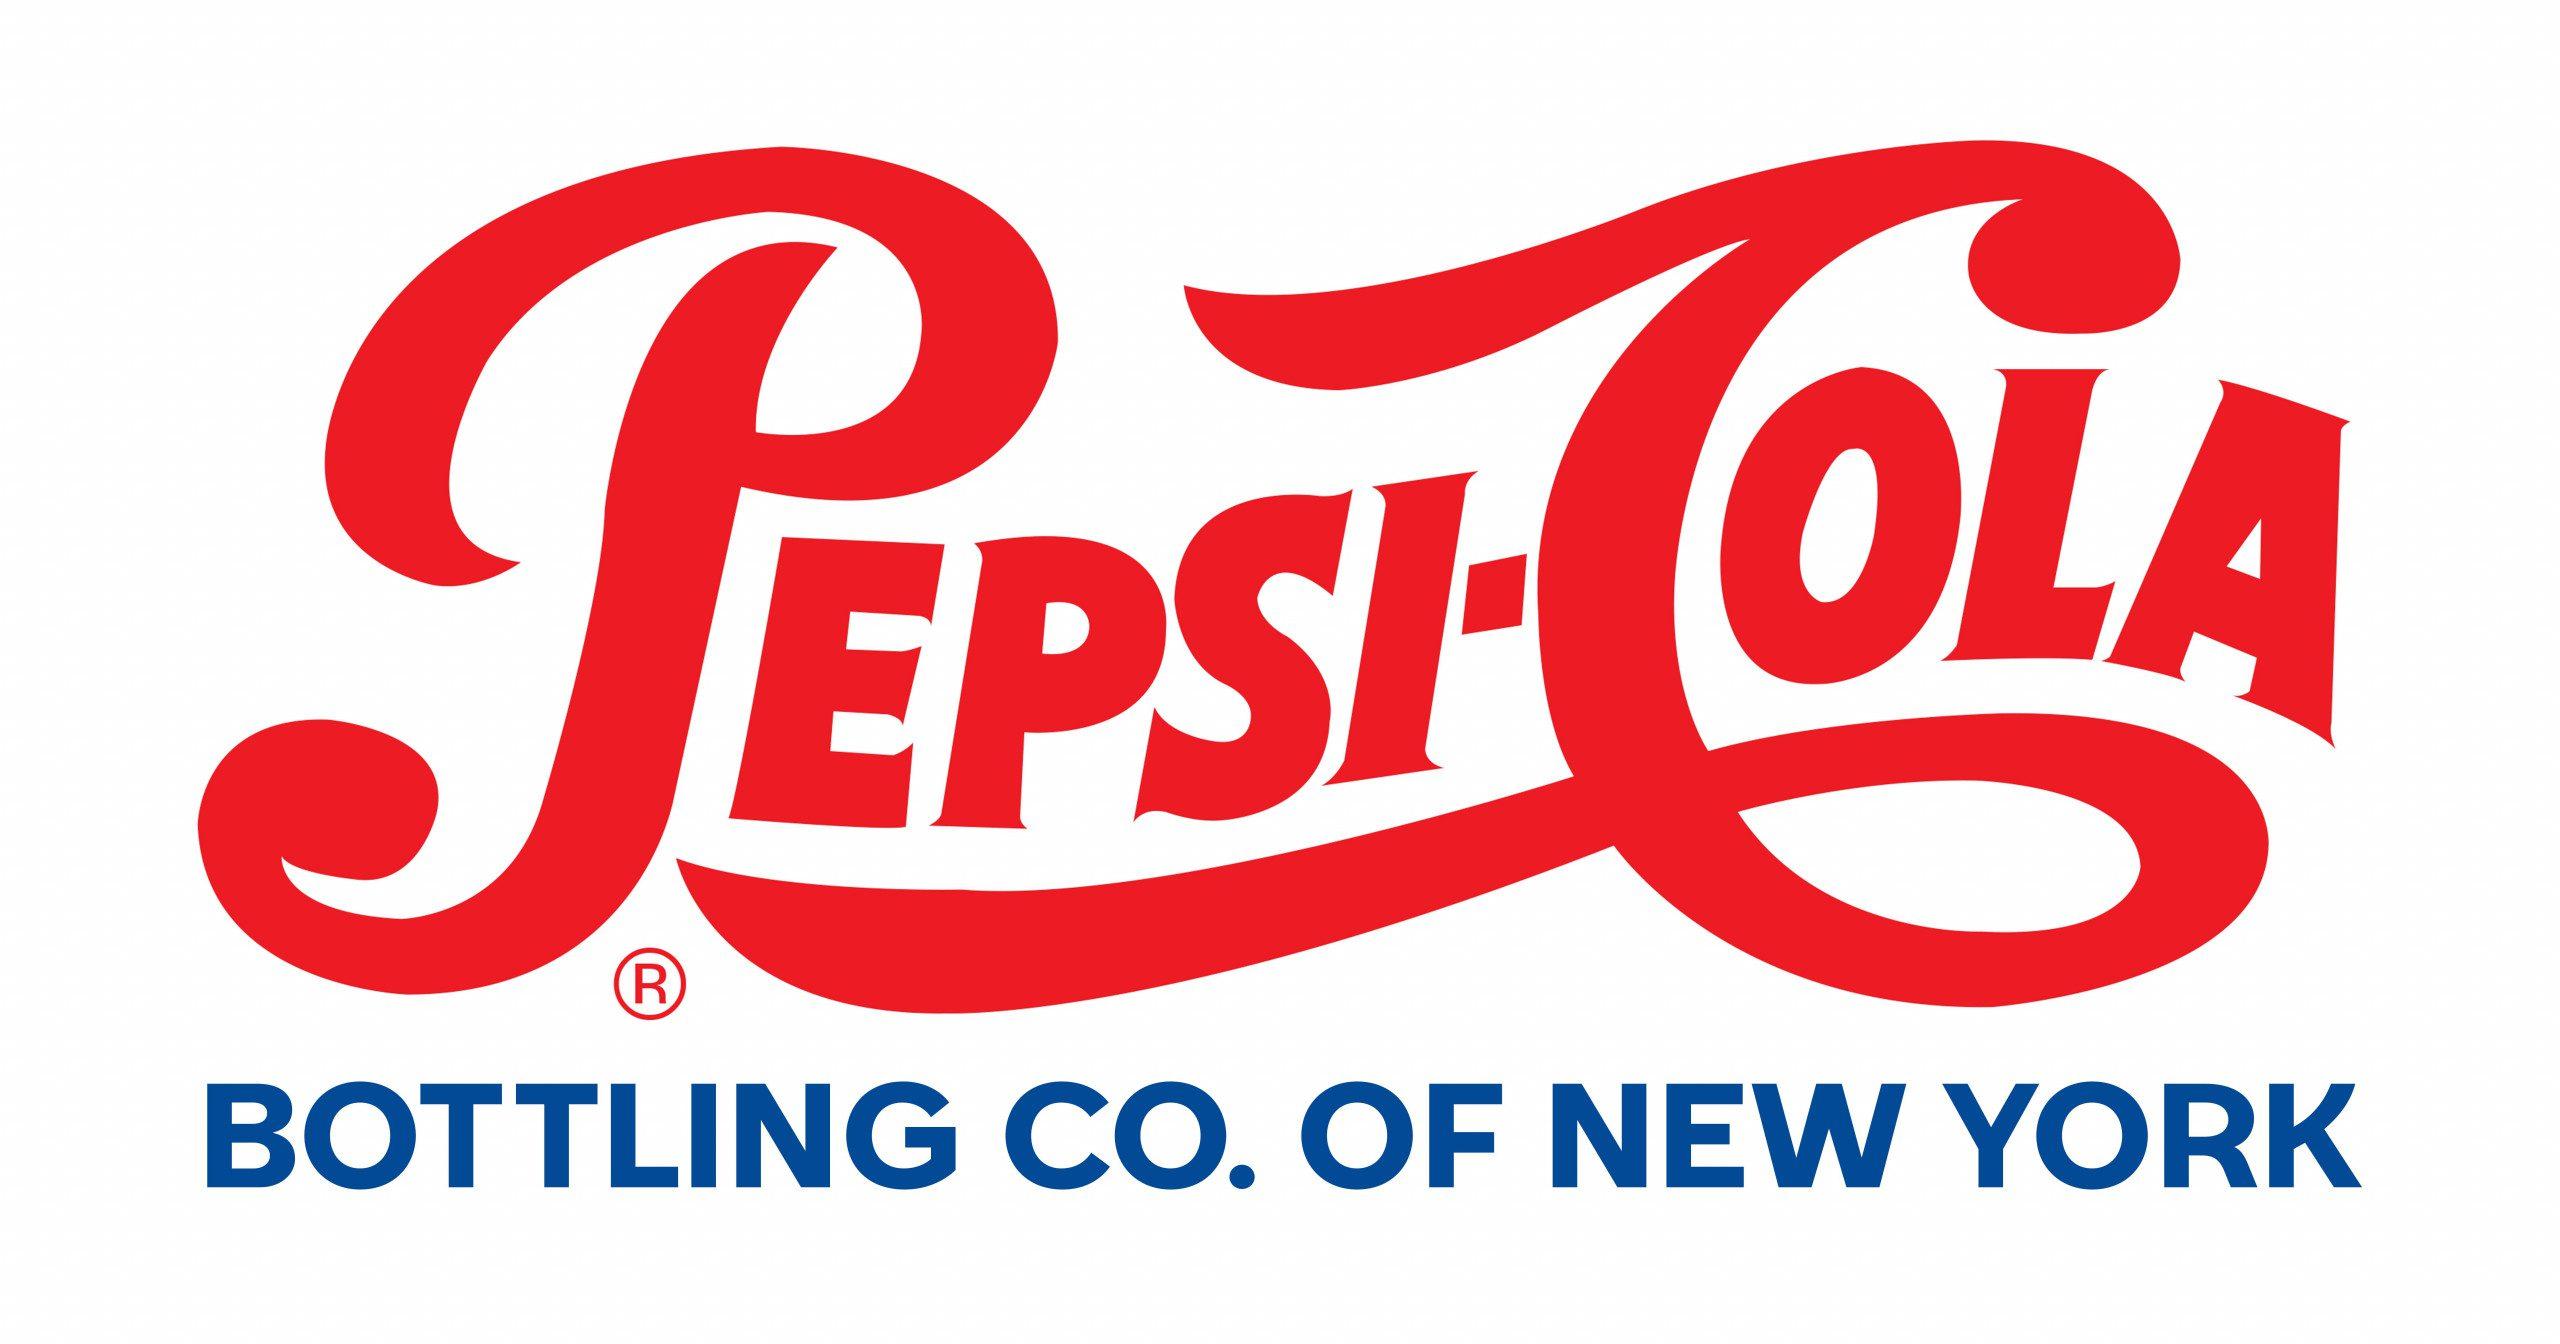 Pepsi Cola Bottling Company of New York logo